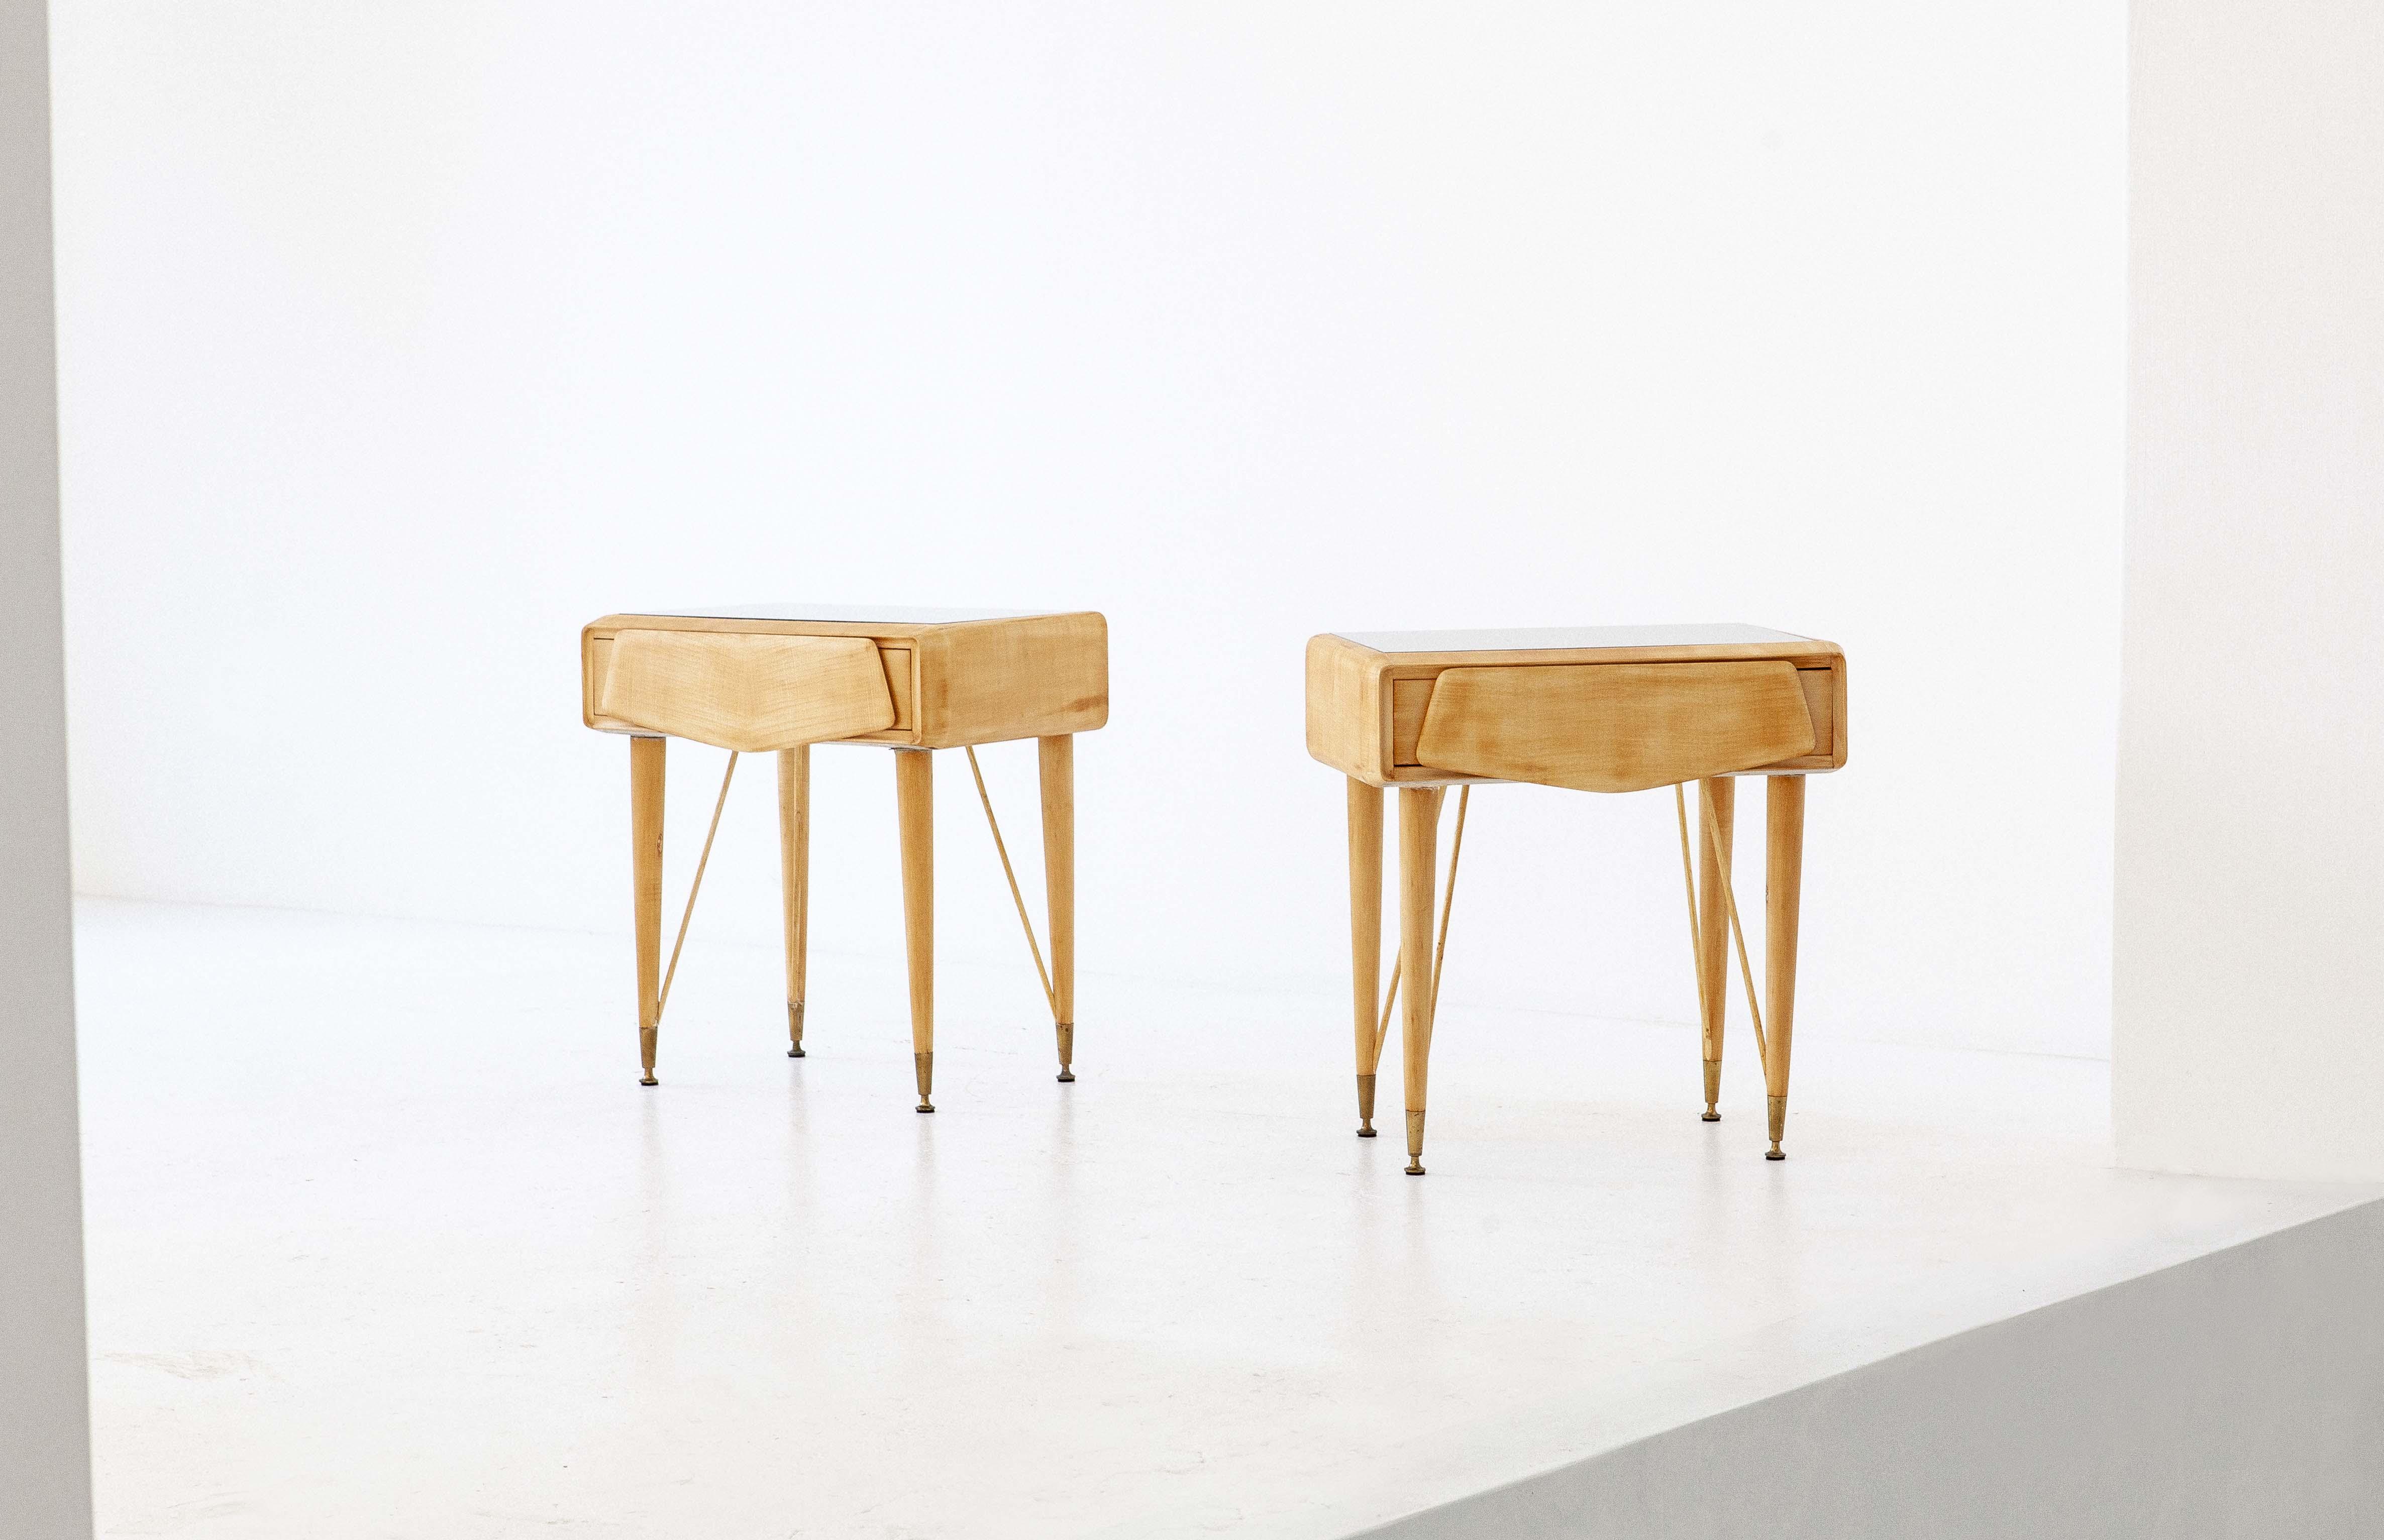 italian-mable-wood-glass-brass-bedside-tables-2-BT77